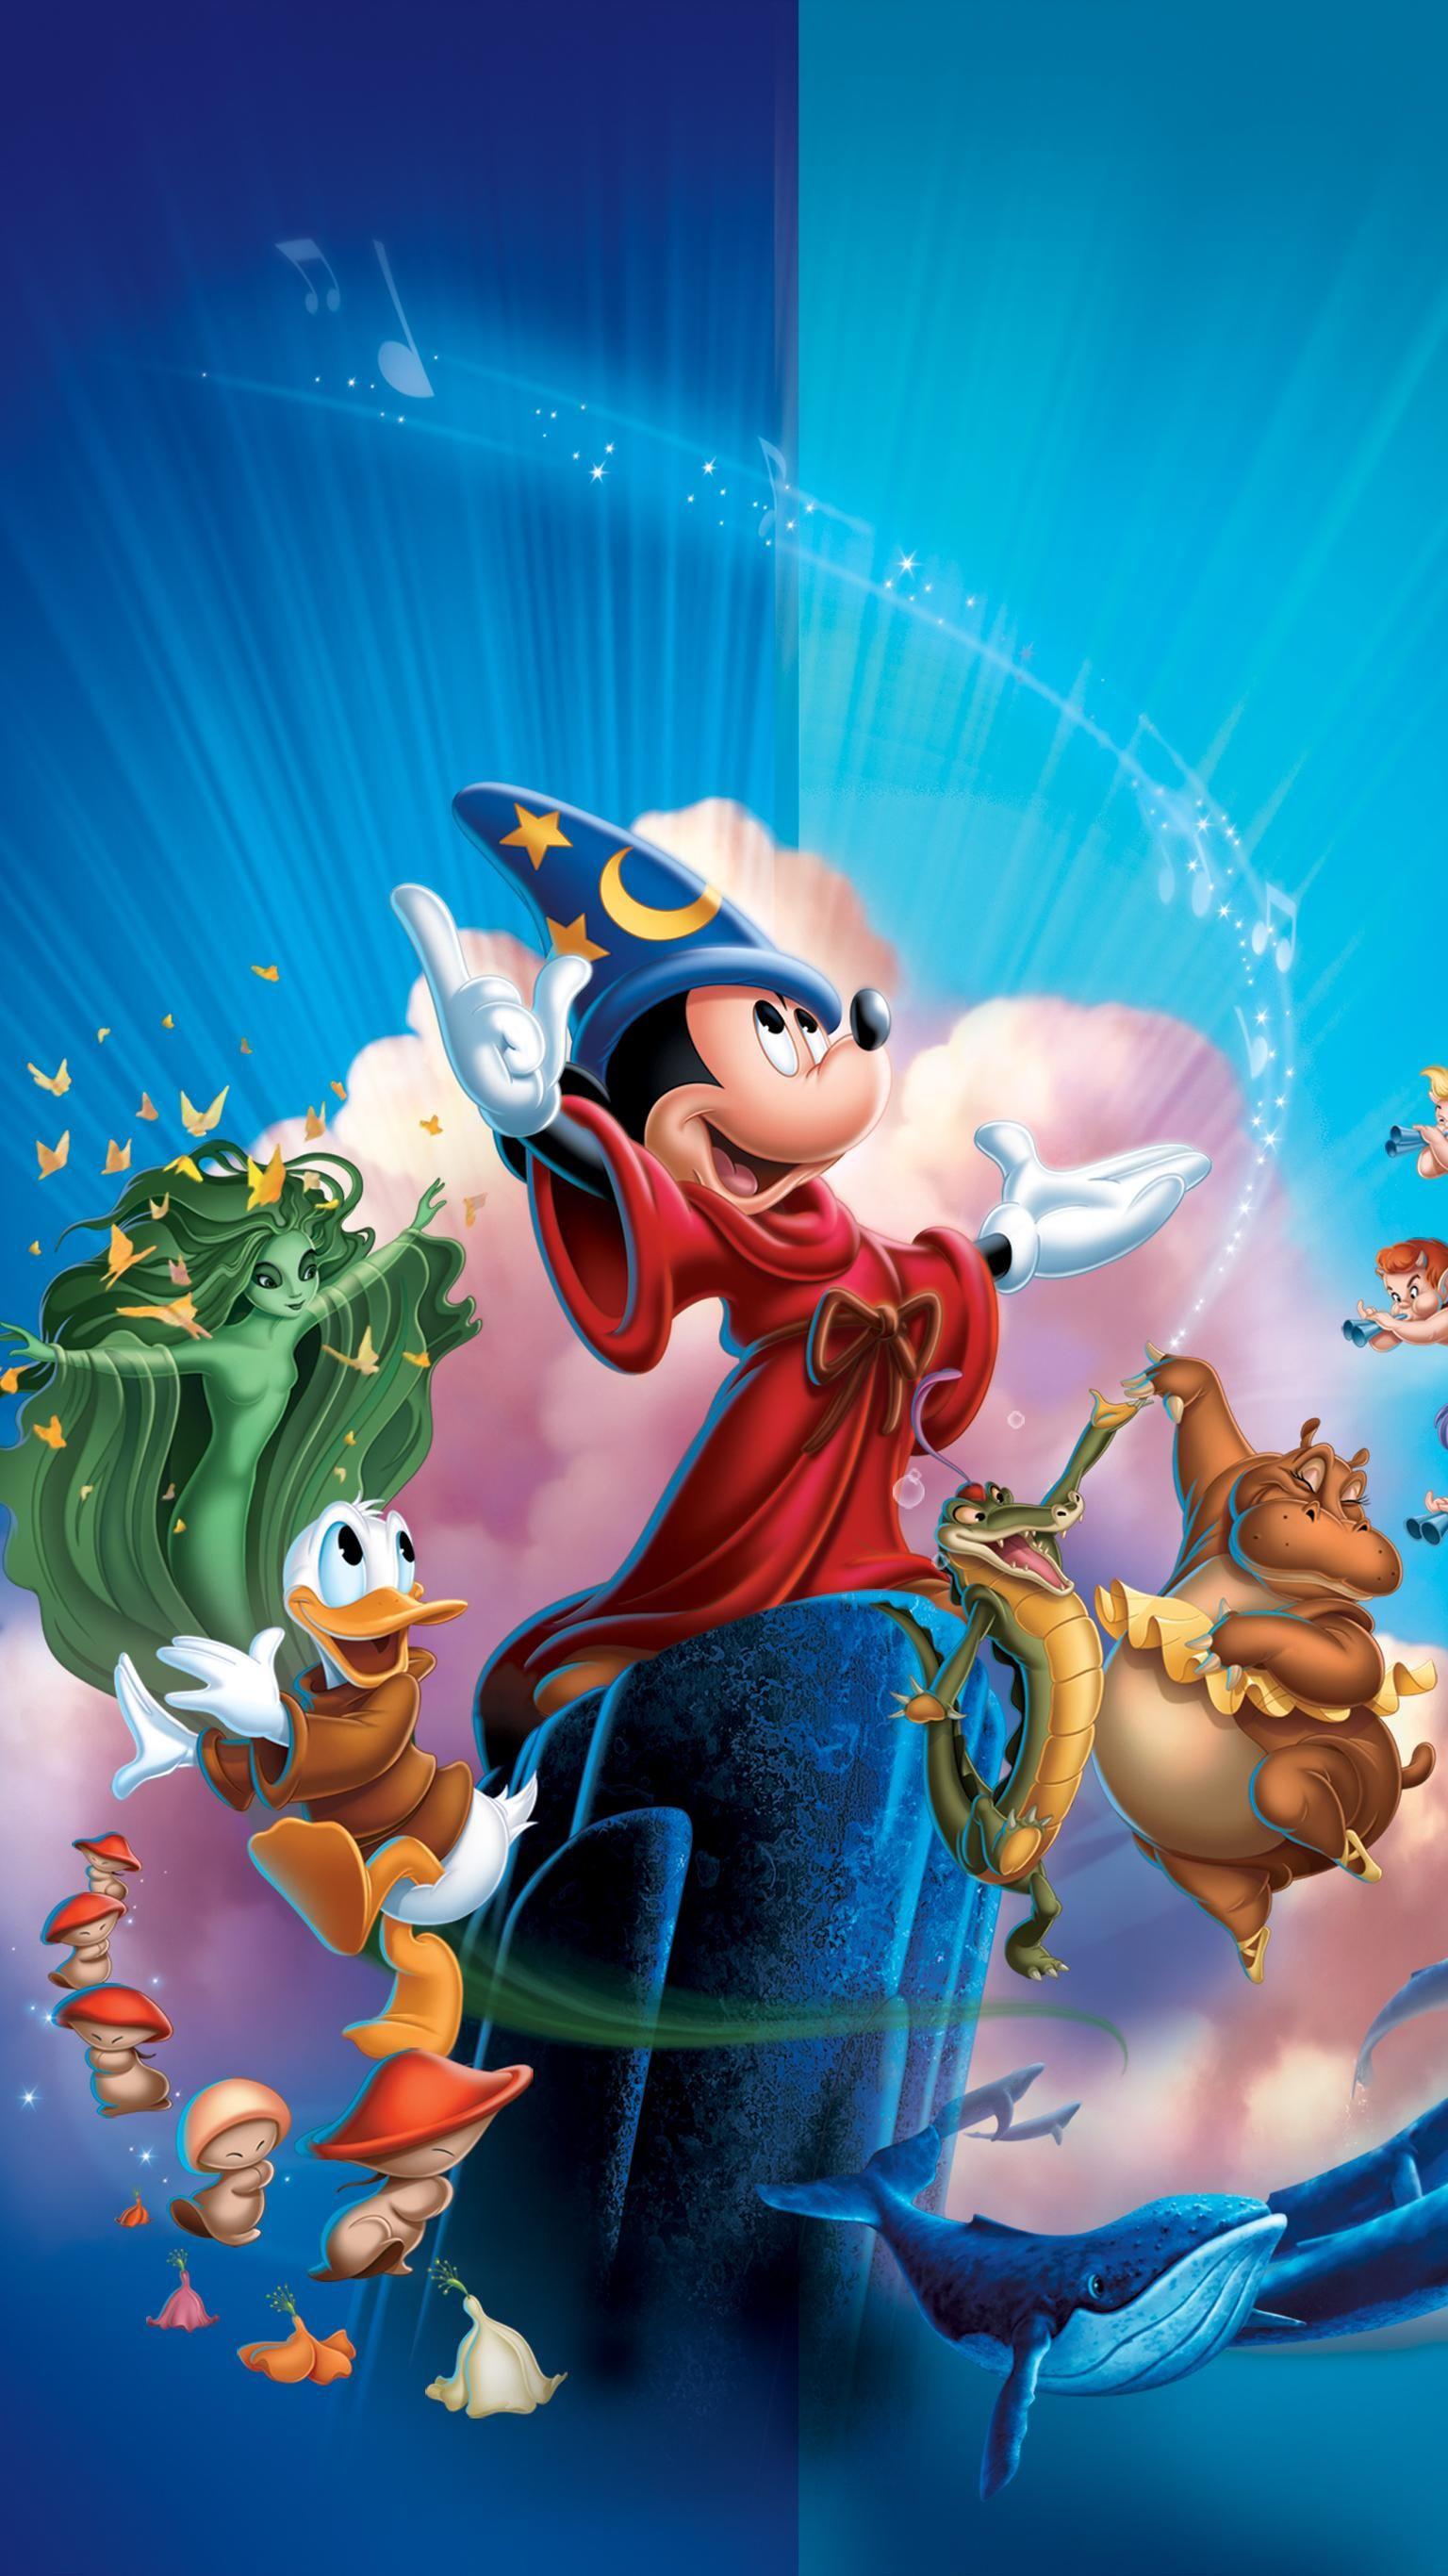 Fantasia 2000 (1999) Phone Wallpaper in 2020 Mickey